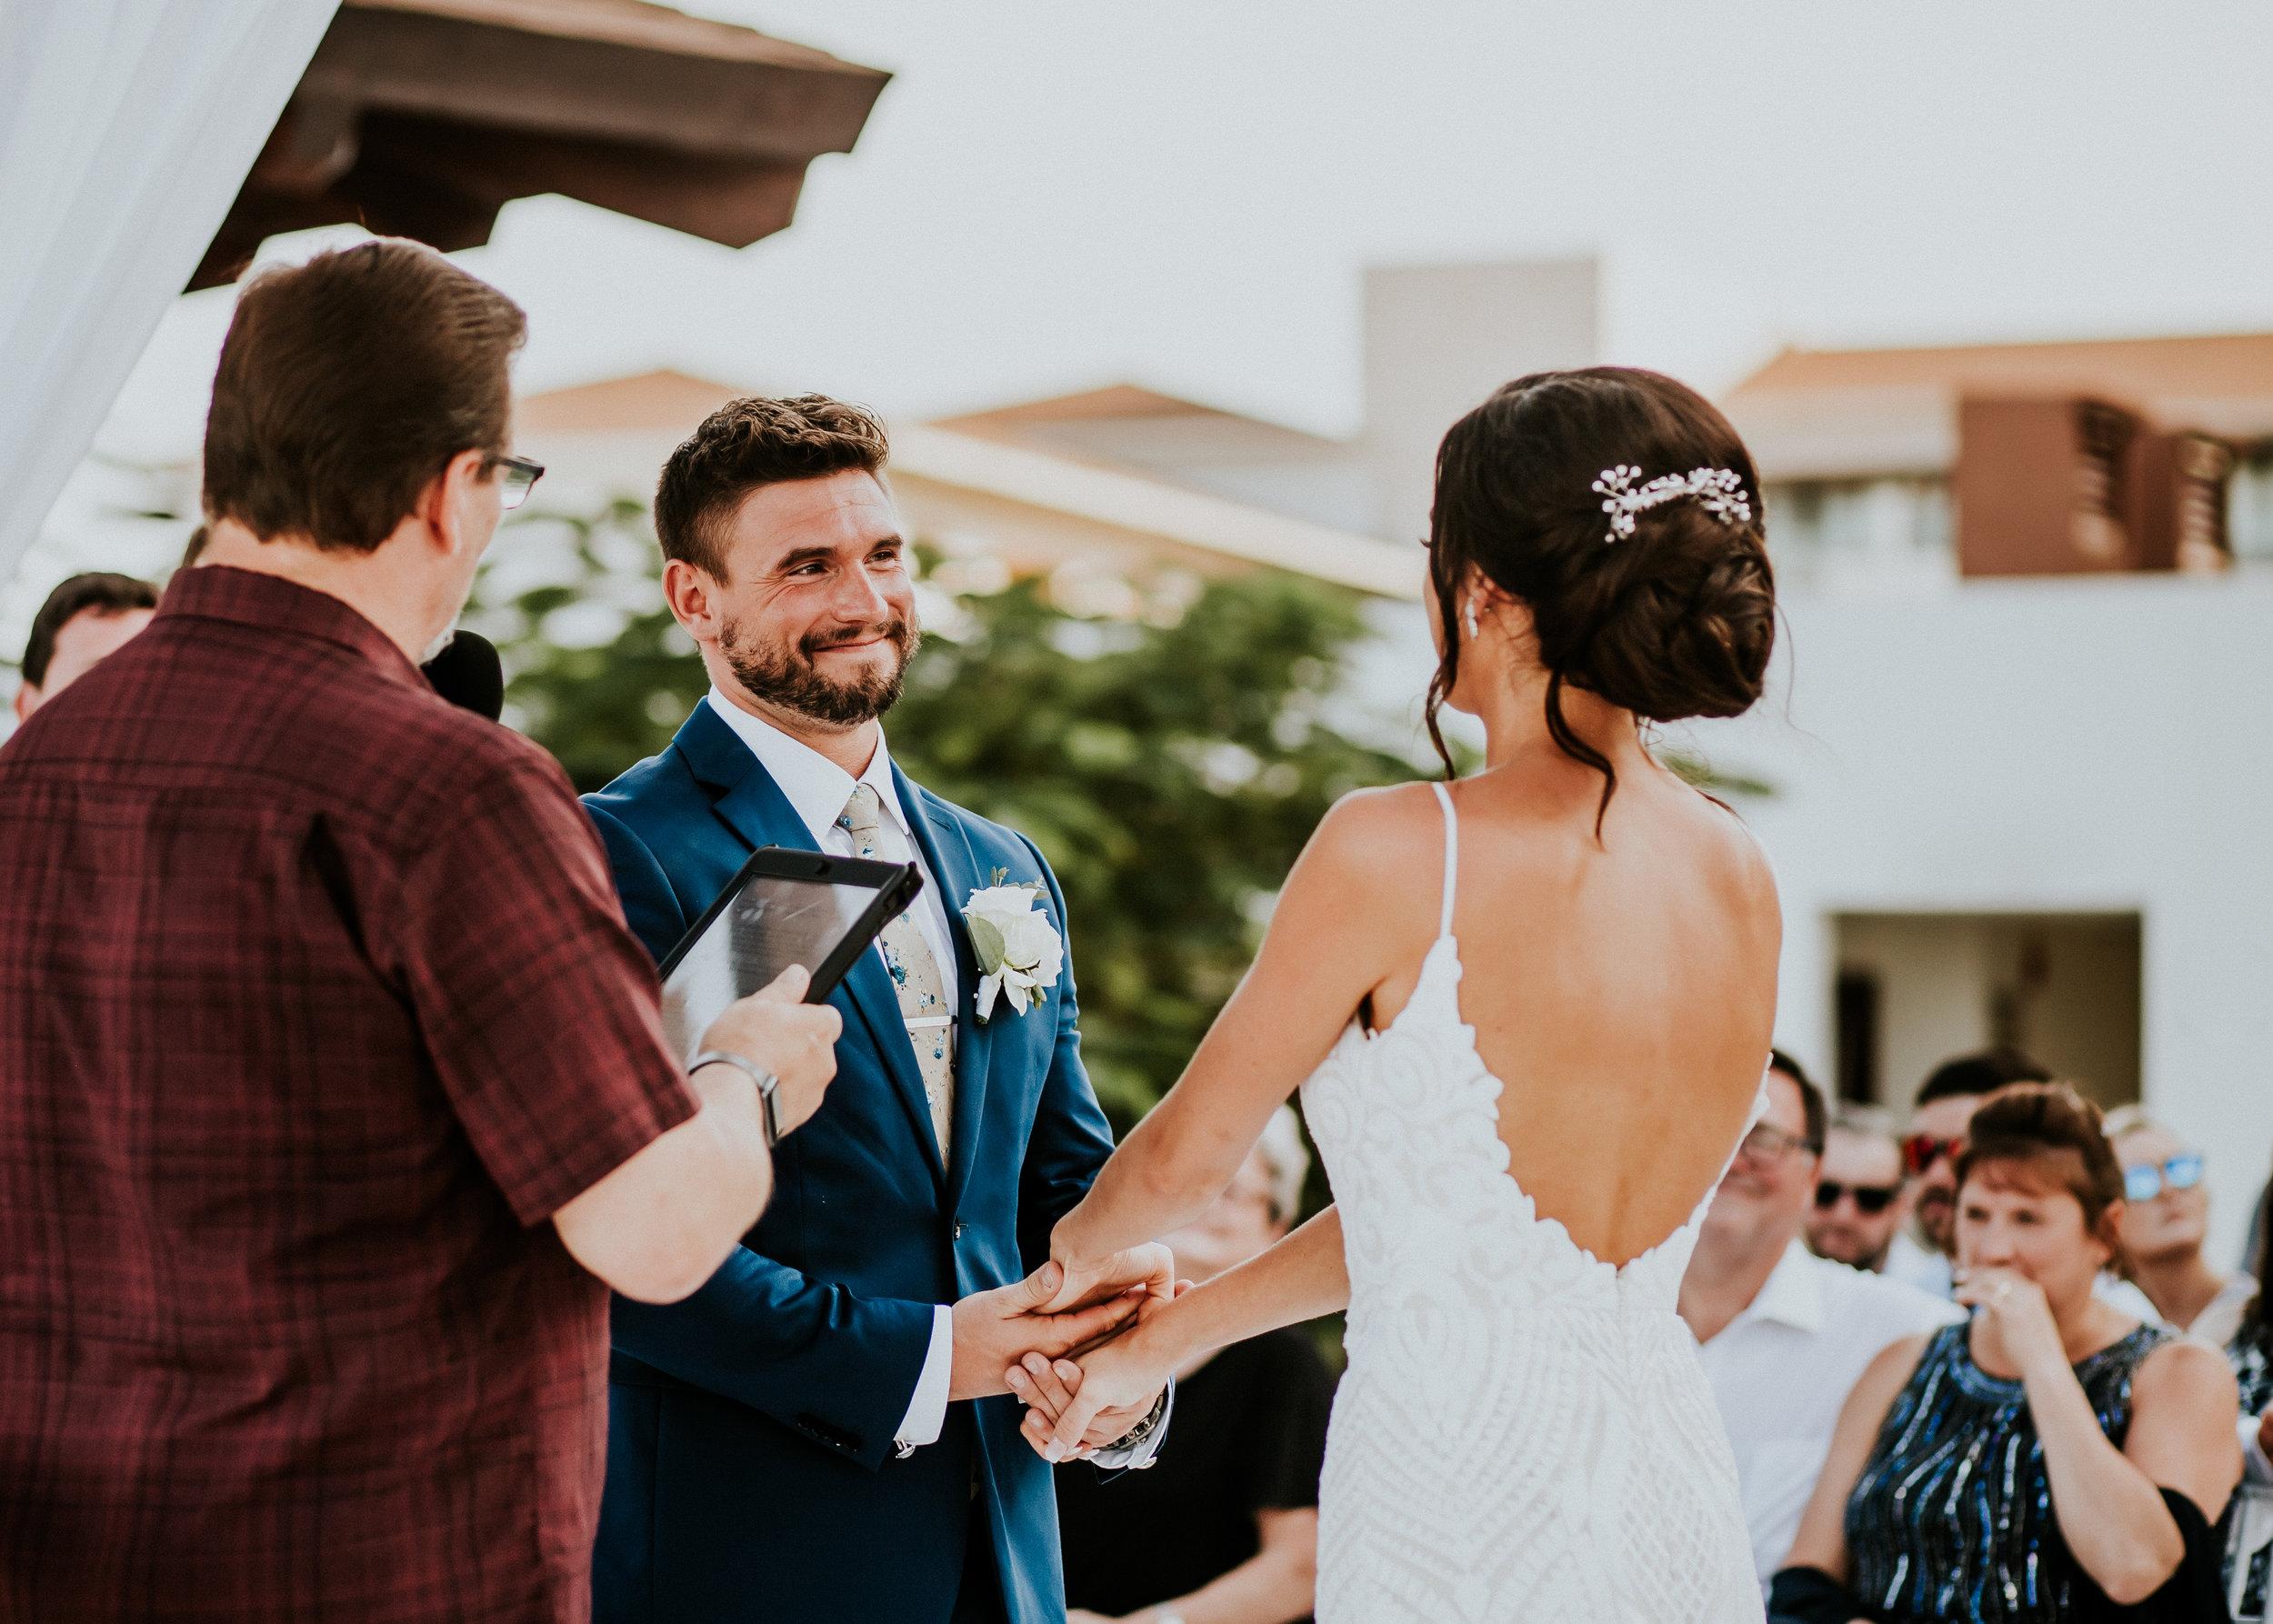 WeddingDay-196.jpg